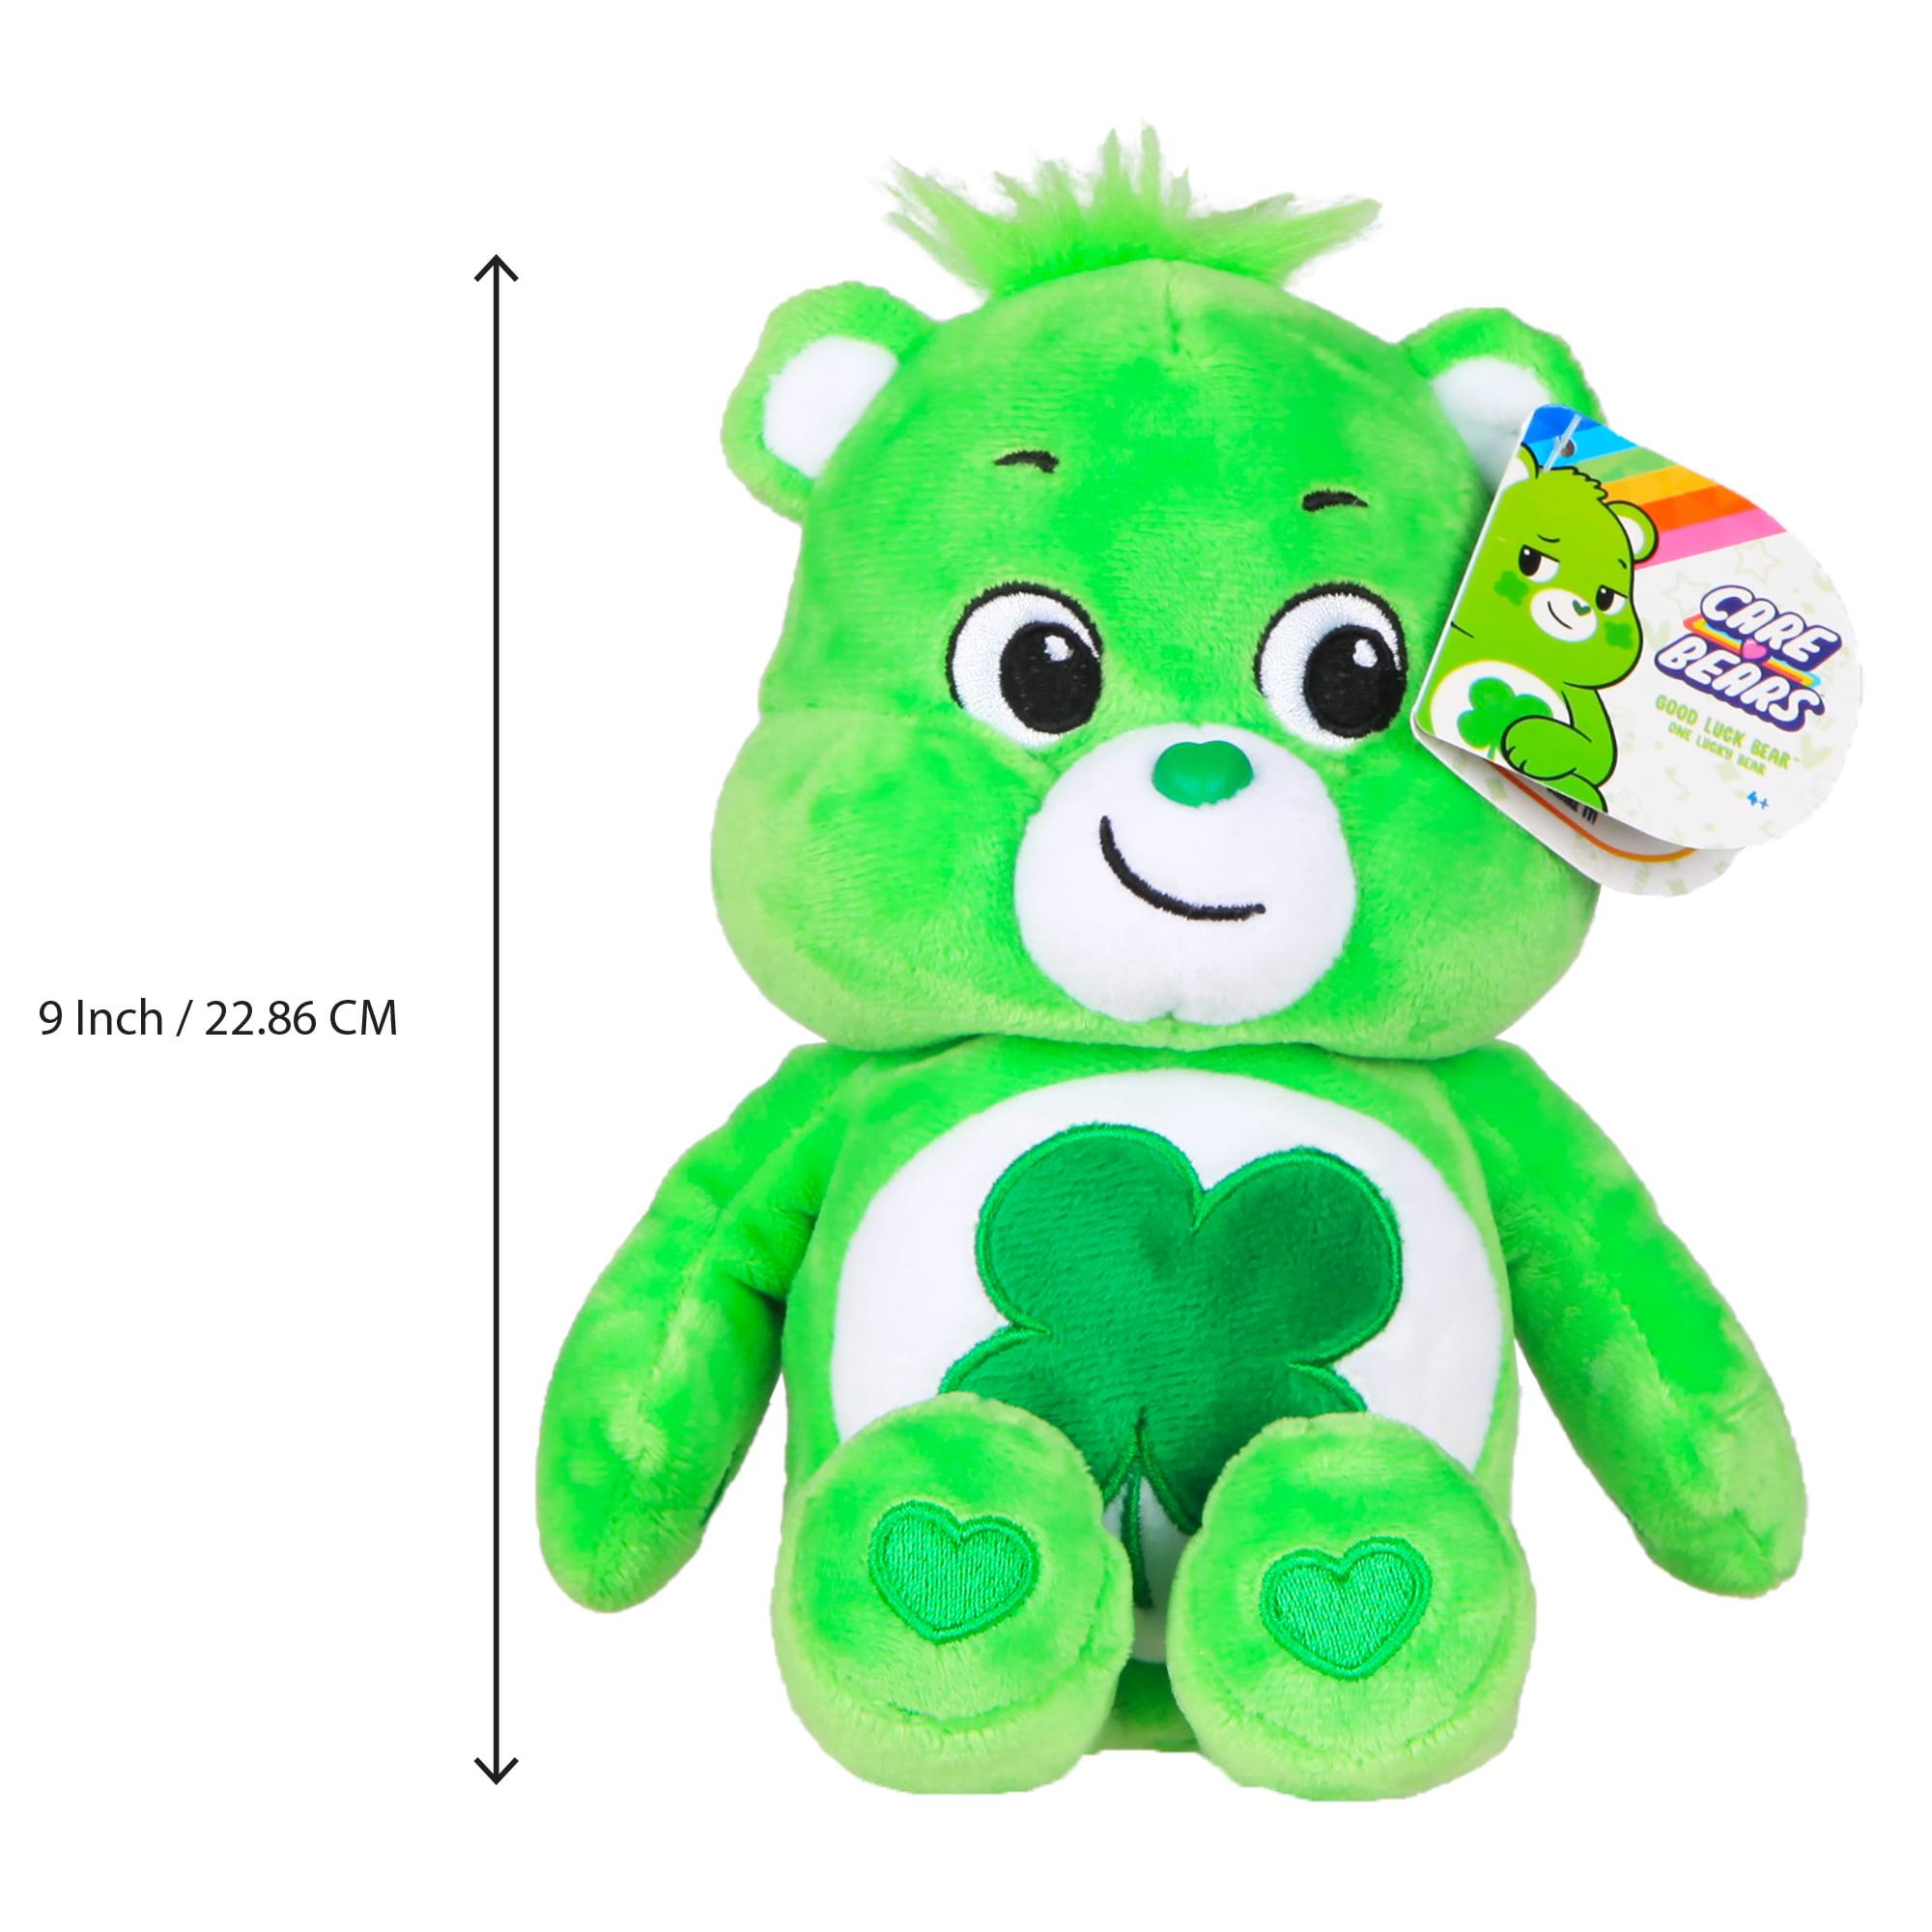 Care Bears GOOD LUCK Backback Clip Keychain Dangler Plush Walmart Exclusive NEW